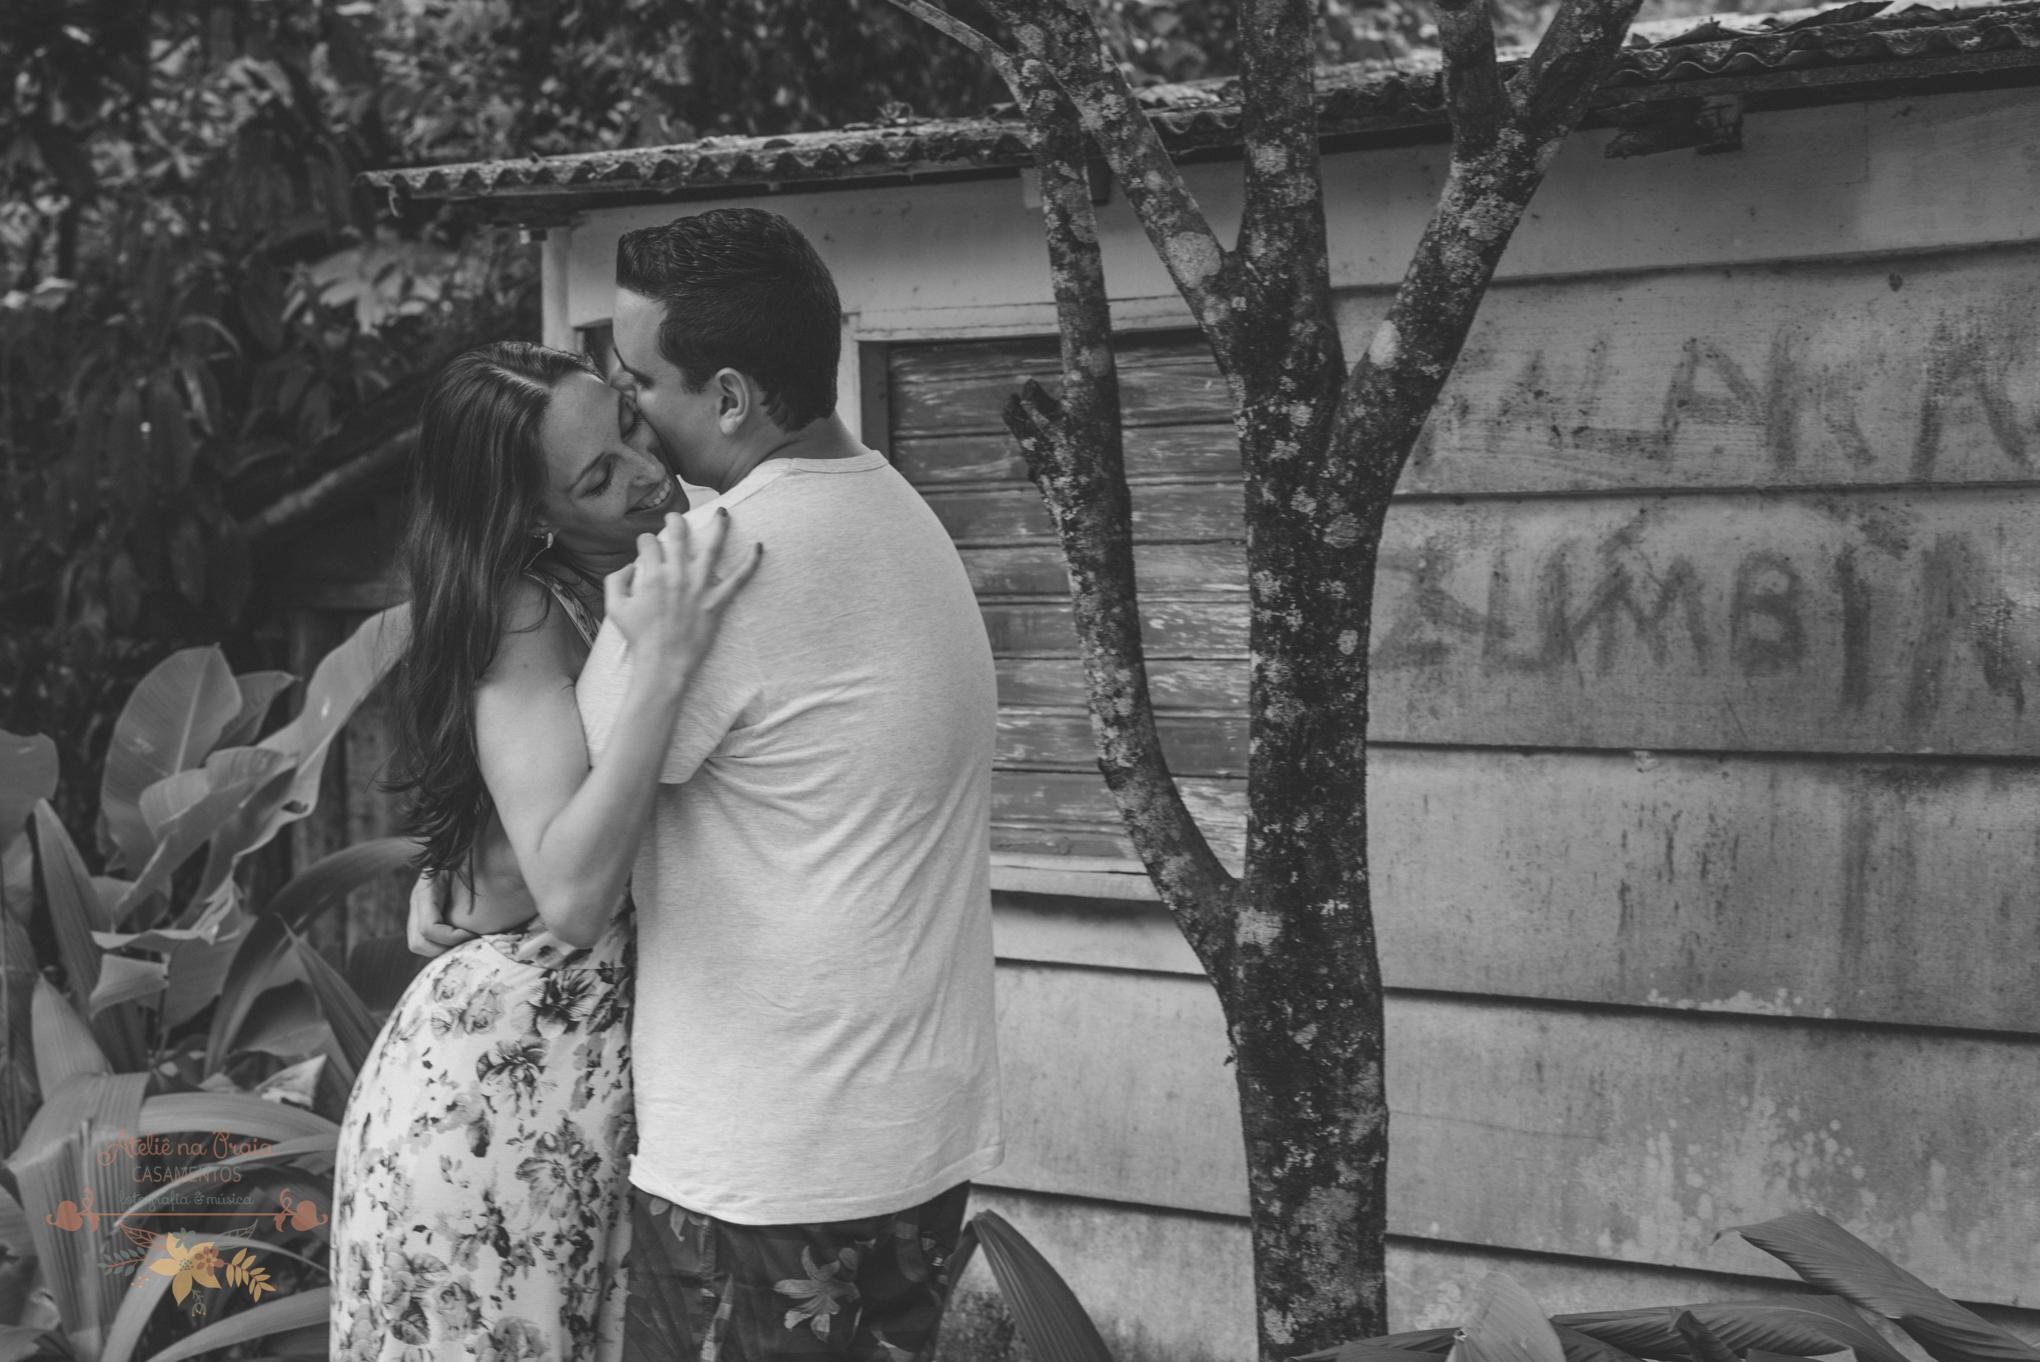 Atelie-na-Praia-Pre-Wedding-Thiesa-Bruno-PQ-2303